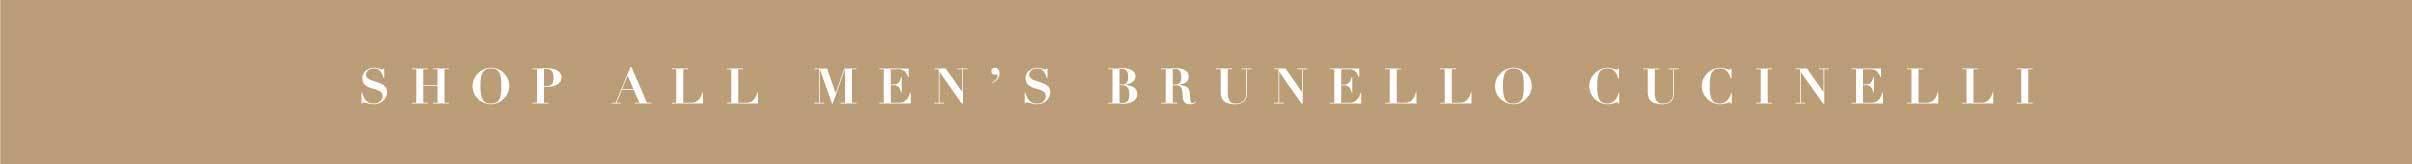 Shop all Men's Brunello Cucinelli